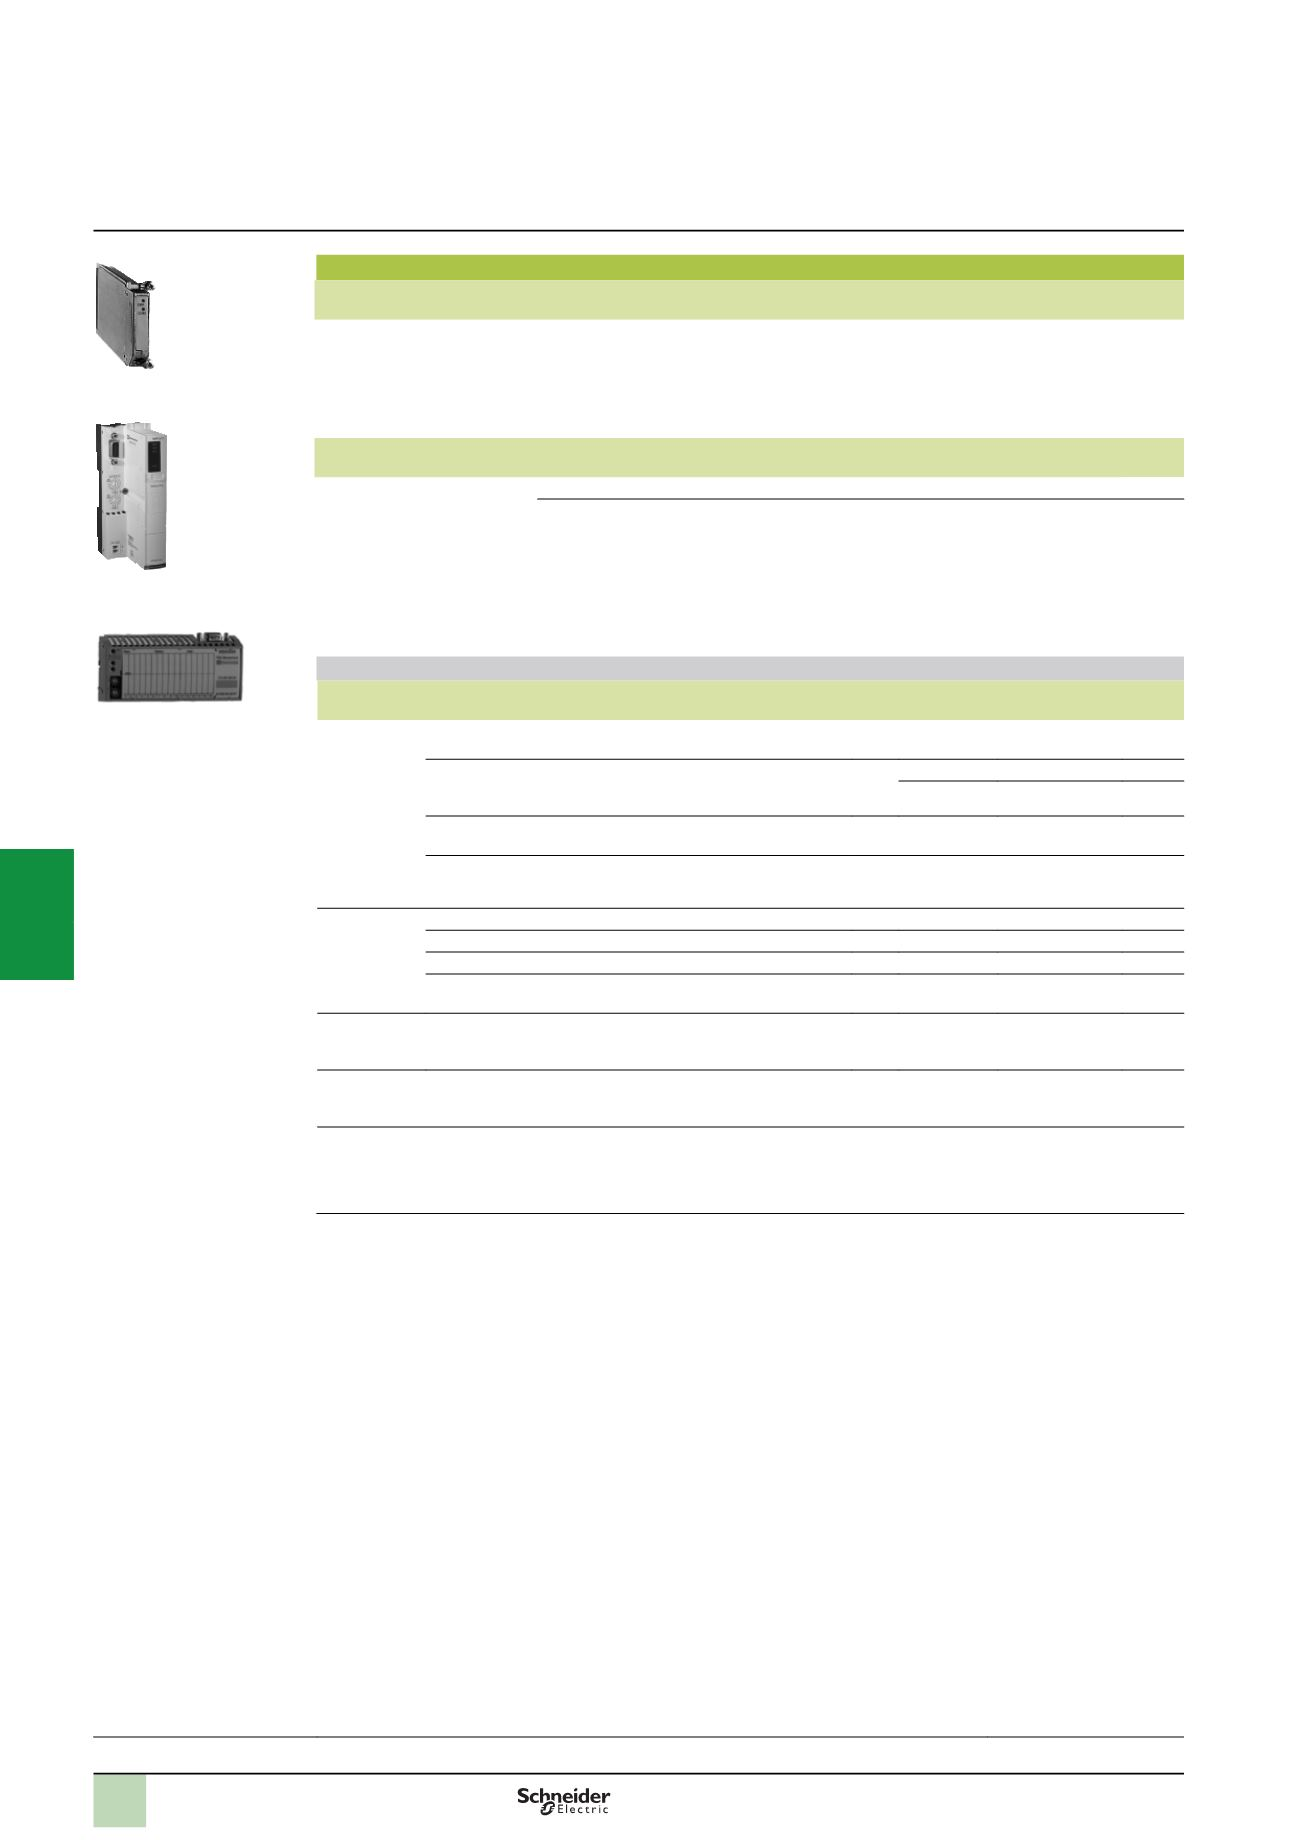 Modicon Premium Automation Platform Catalogue May 2012 Modbus Plus Wiring Page Background